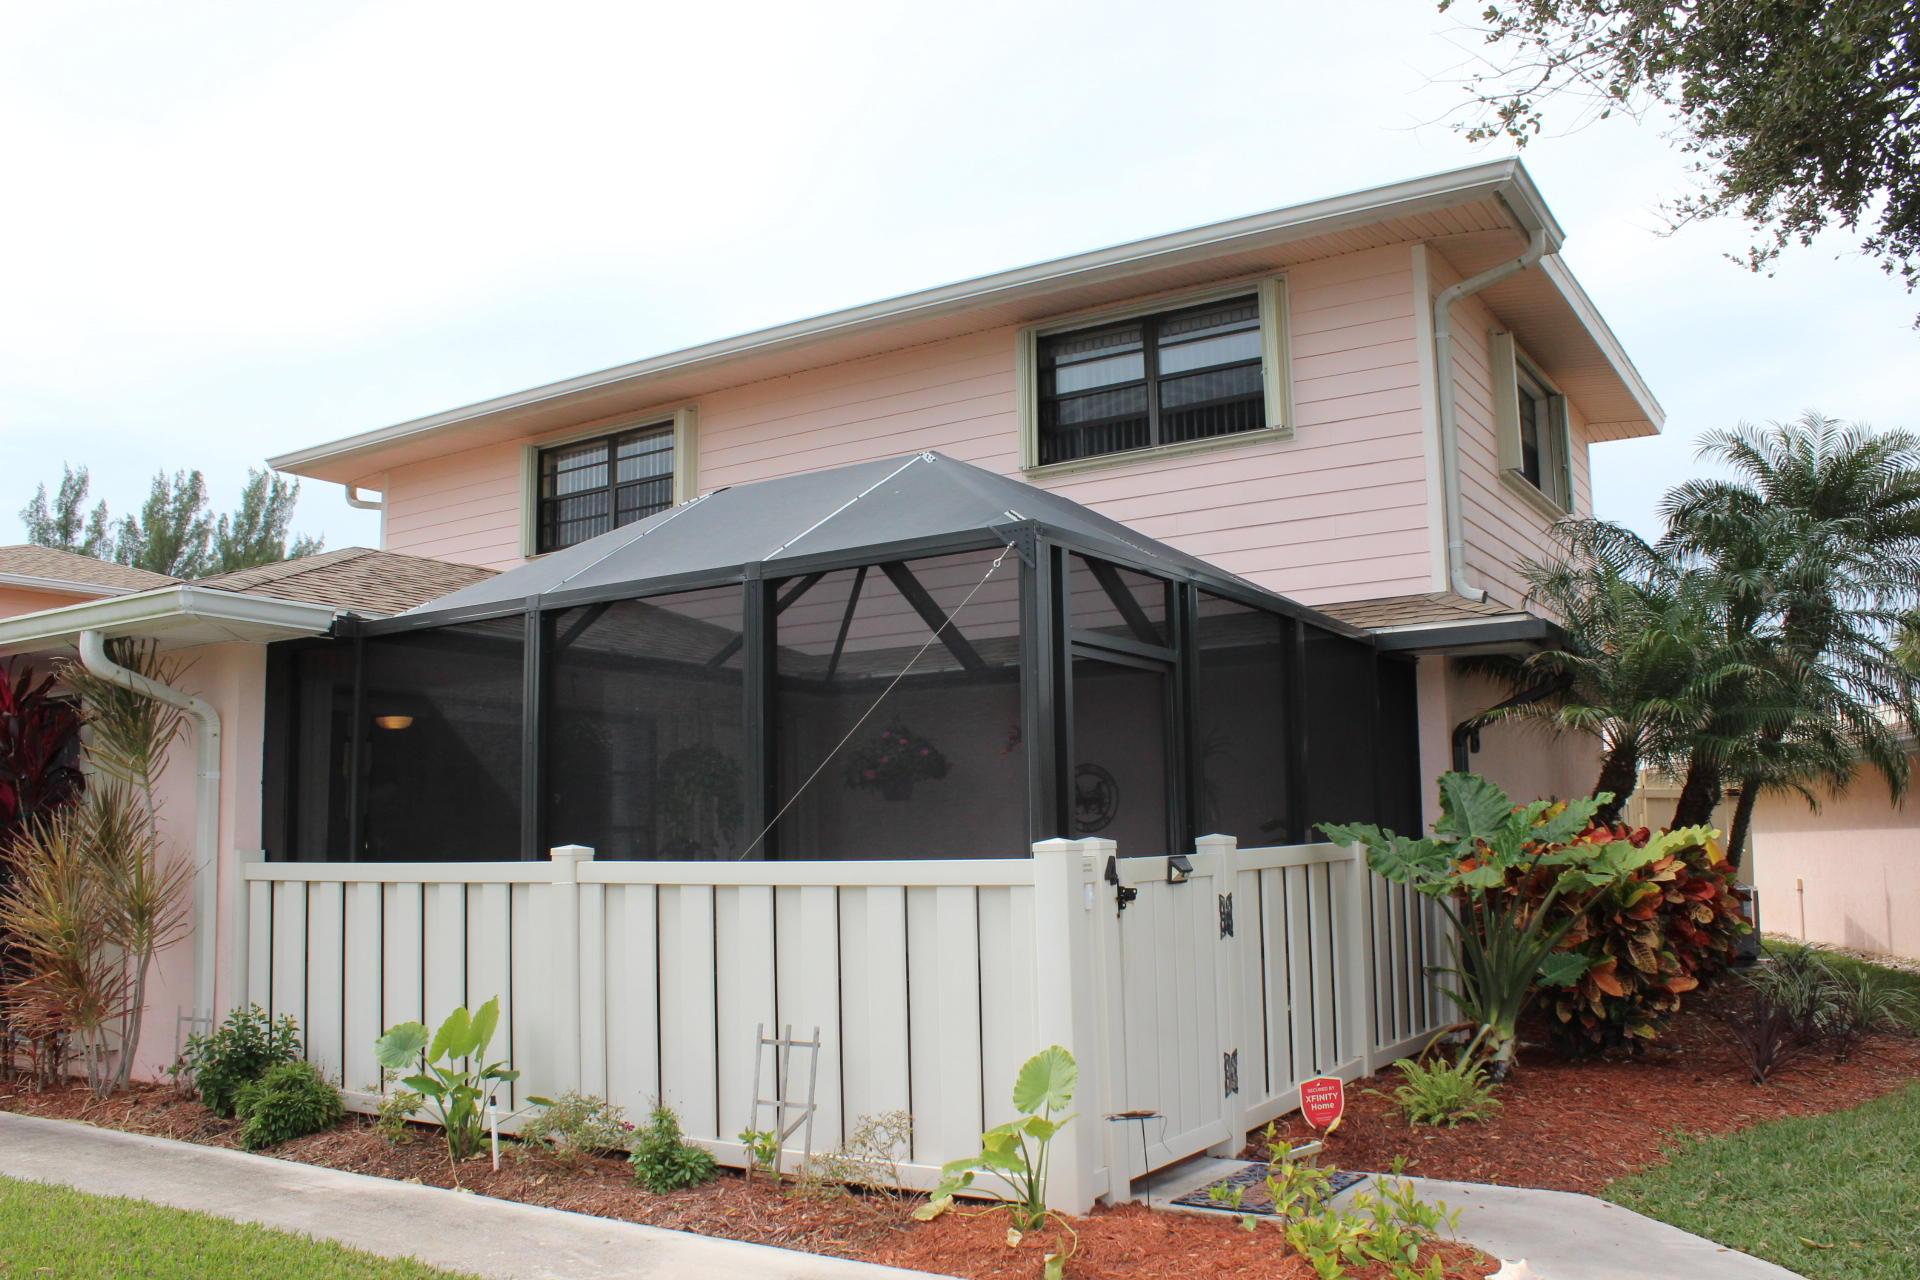 1771 Gulfstream B4 Avenue, Fort Pierce, FL 34949